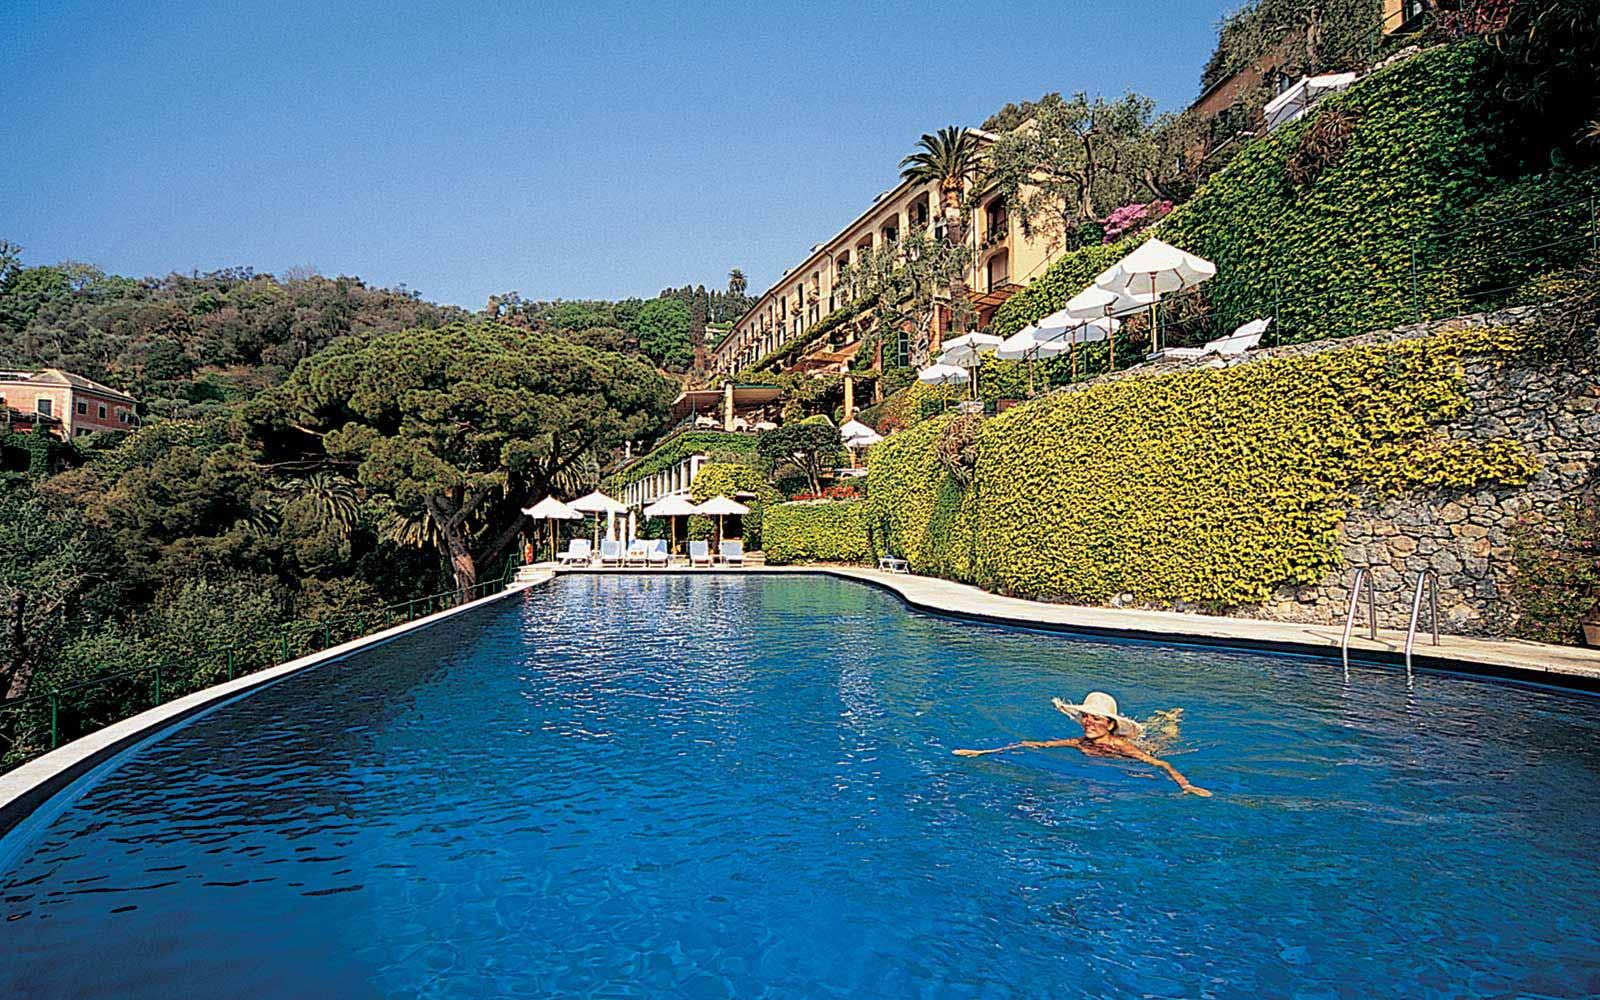 Belmond Hotel Splendido Splendido Mare Portofino Ligurian Riviera